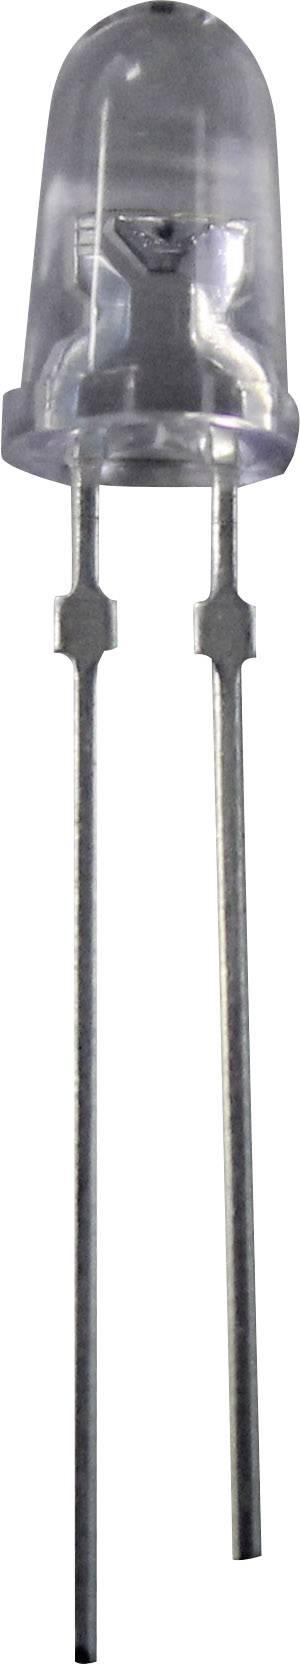 LED dioda kulatá s vývody Nichia, 20 mA, 5 mm, 3,2 V, 30 °, 16000 mcd, zelená, NSPG510AS